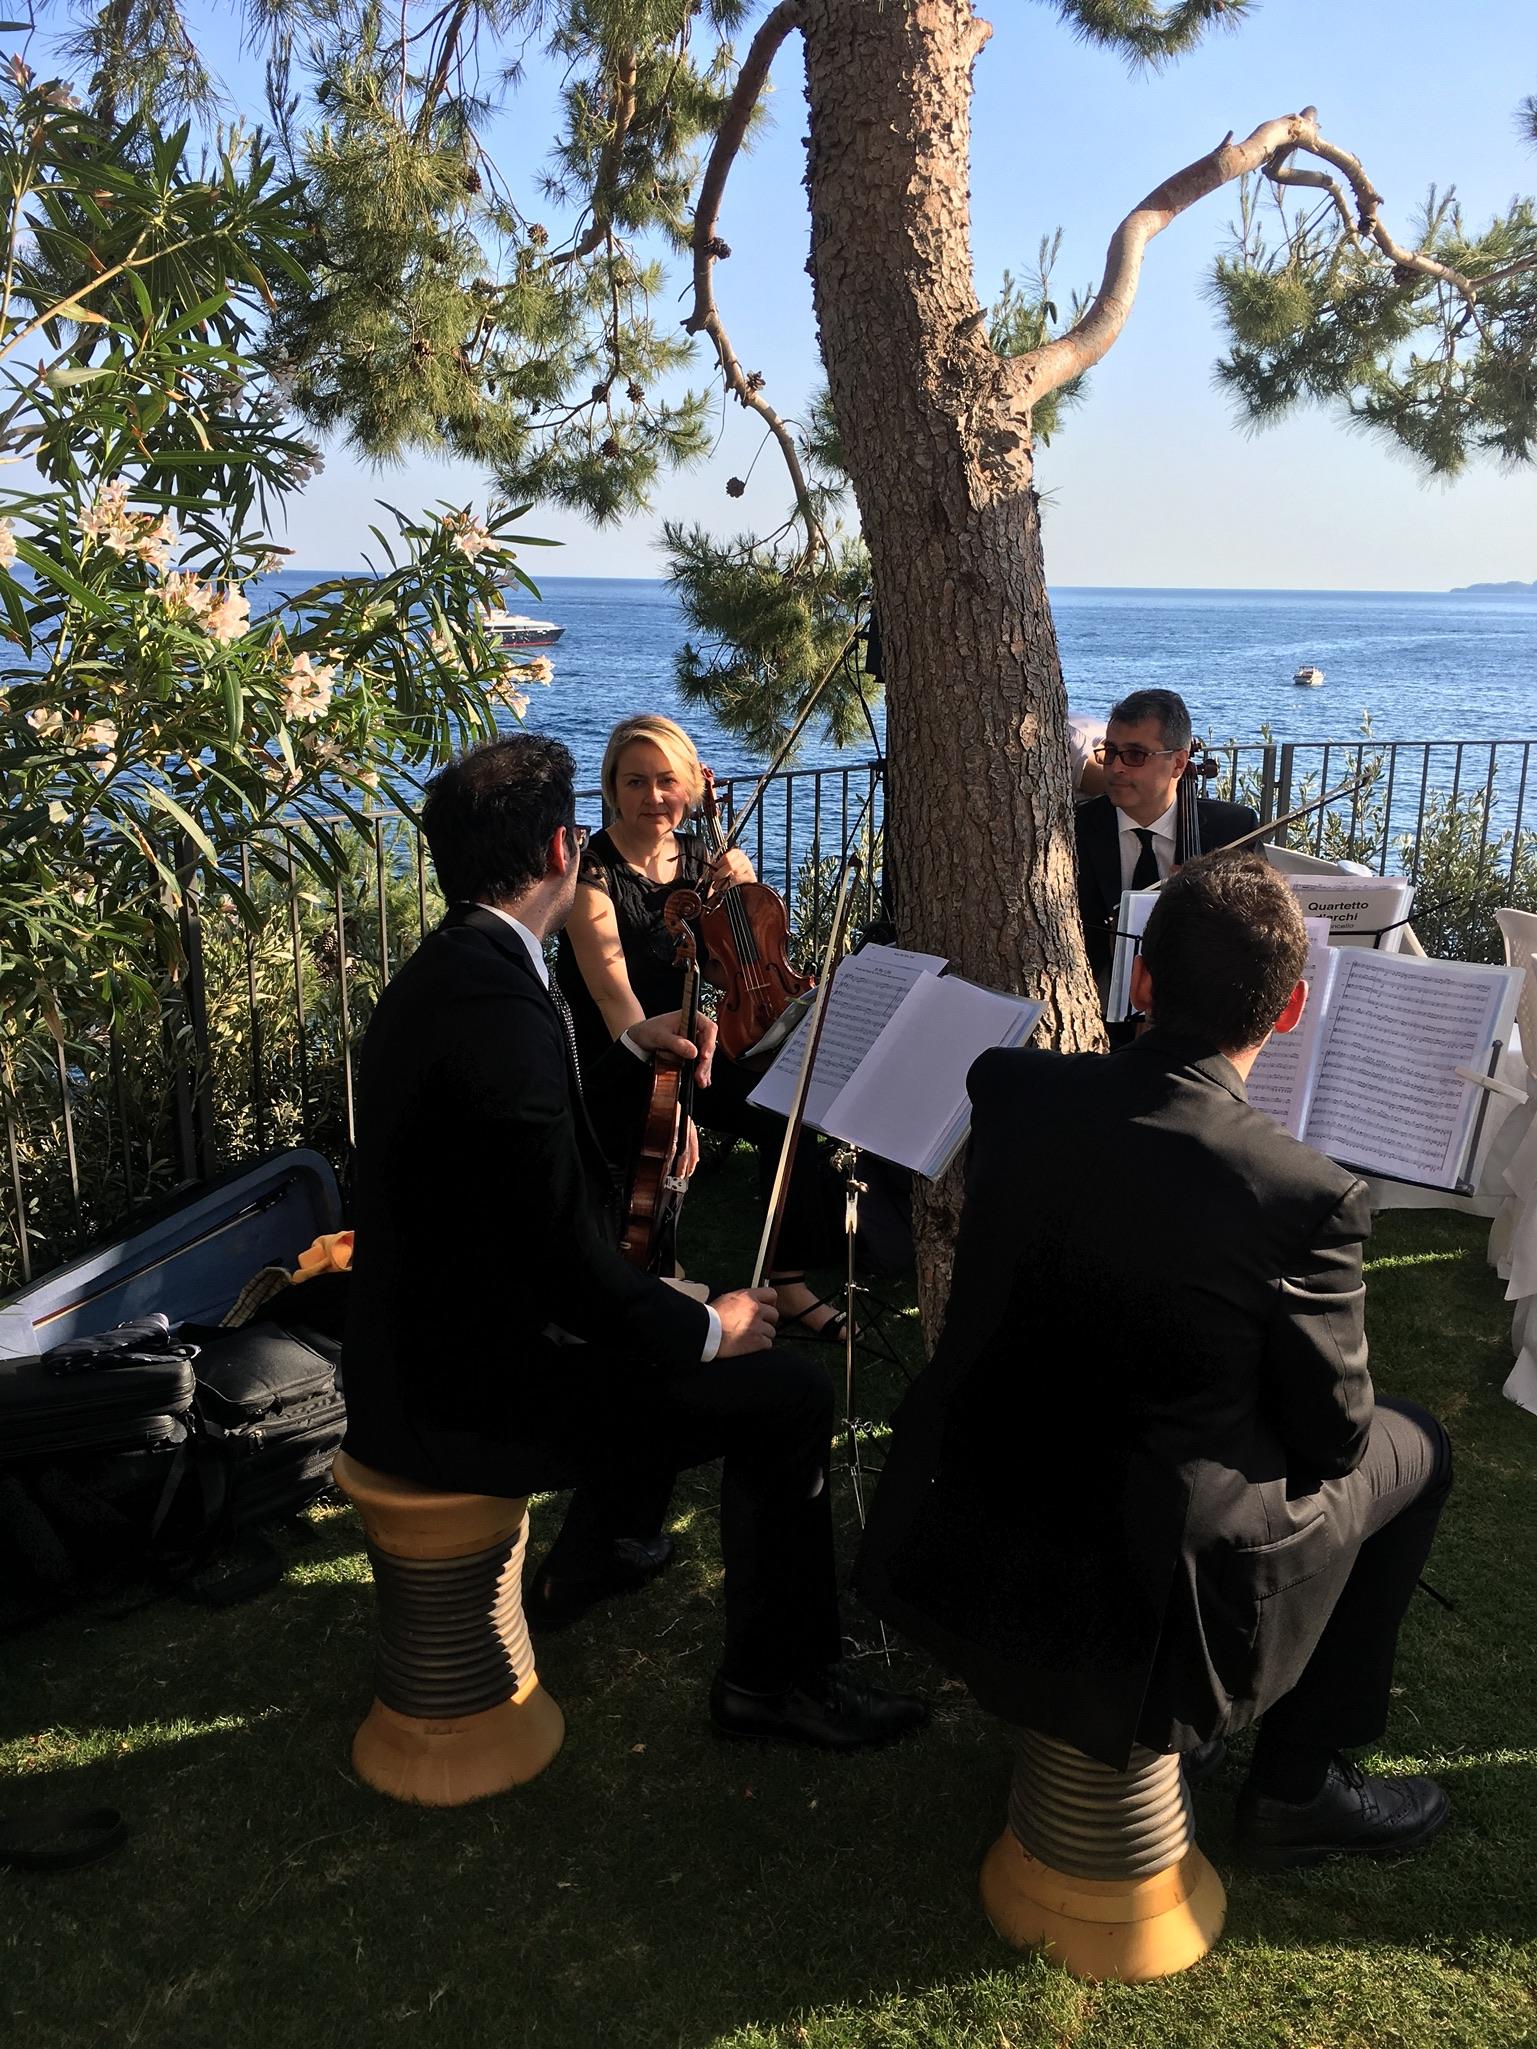 http://www.weddingamalfi.com/wp-content/uploads/Nathalie-and-Benjamin-wedding-in-Positano-14.jpg